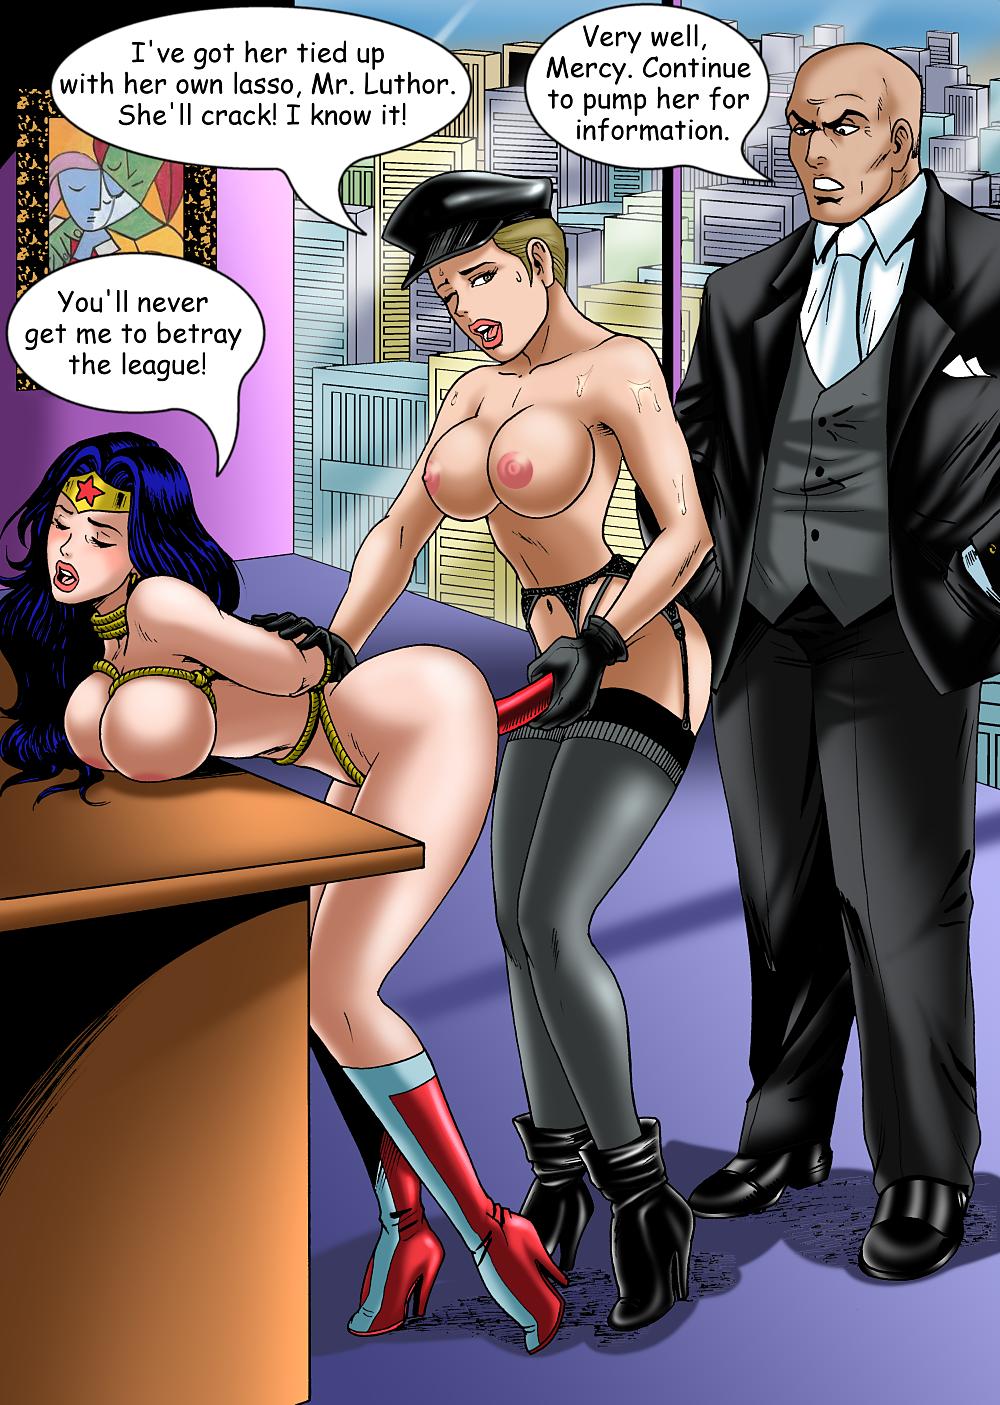 Wonder women hentai porn wallpaper nudes photos